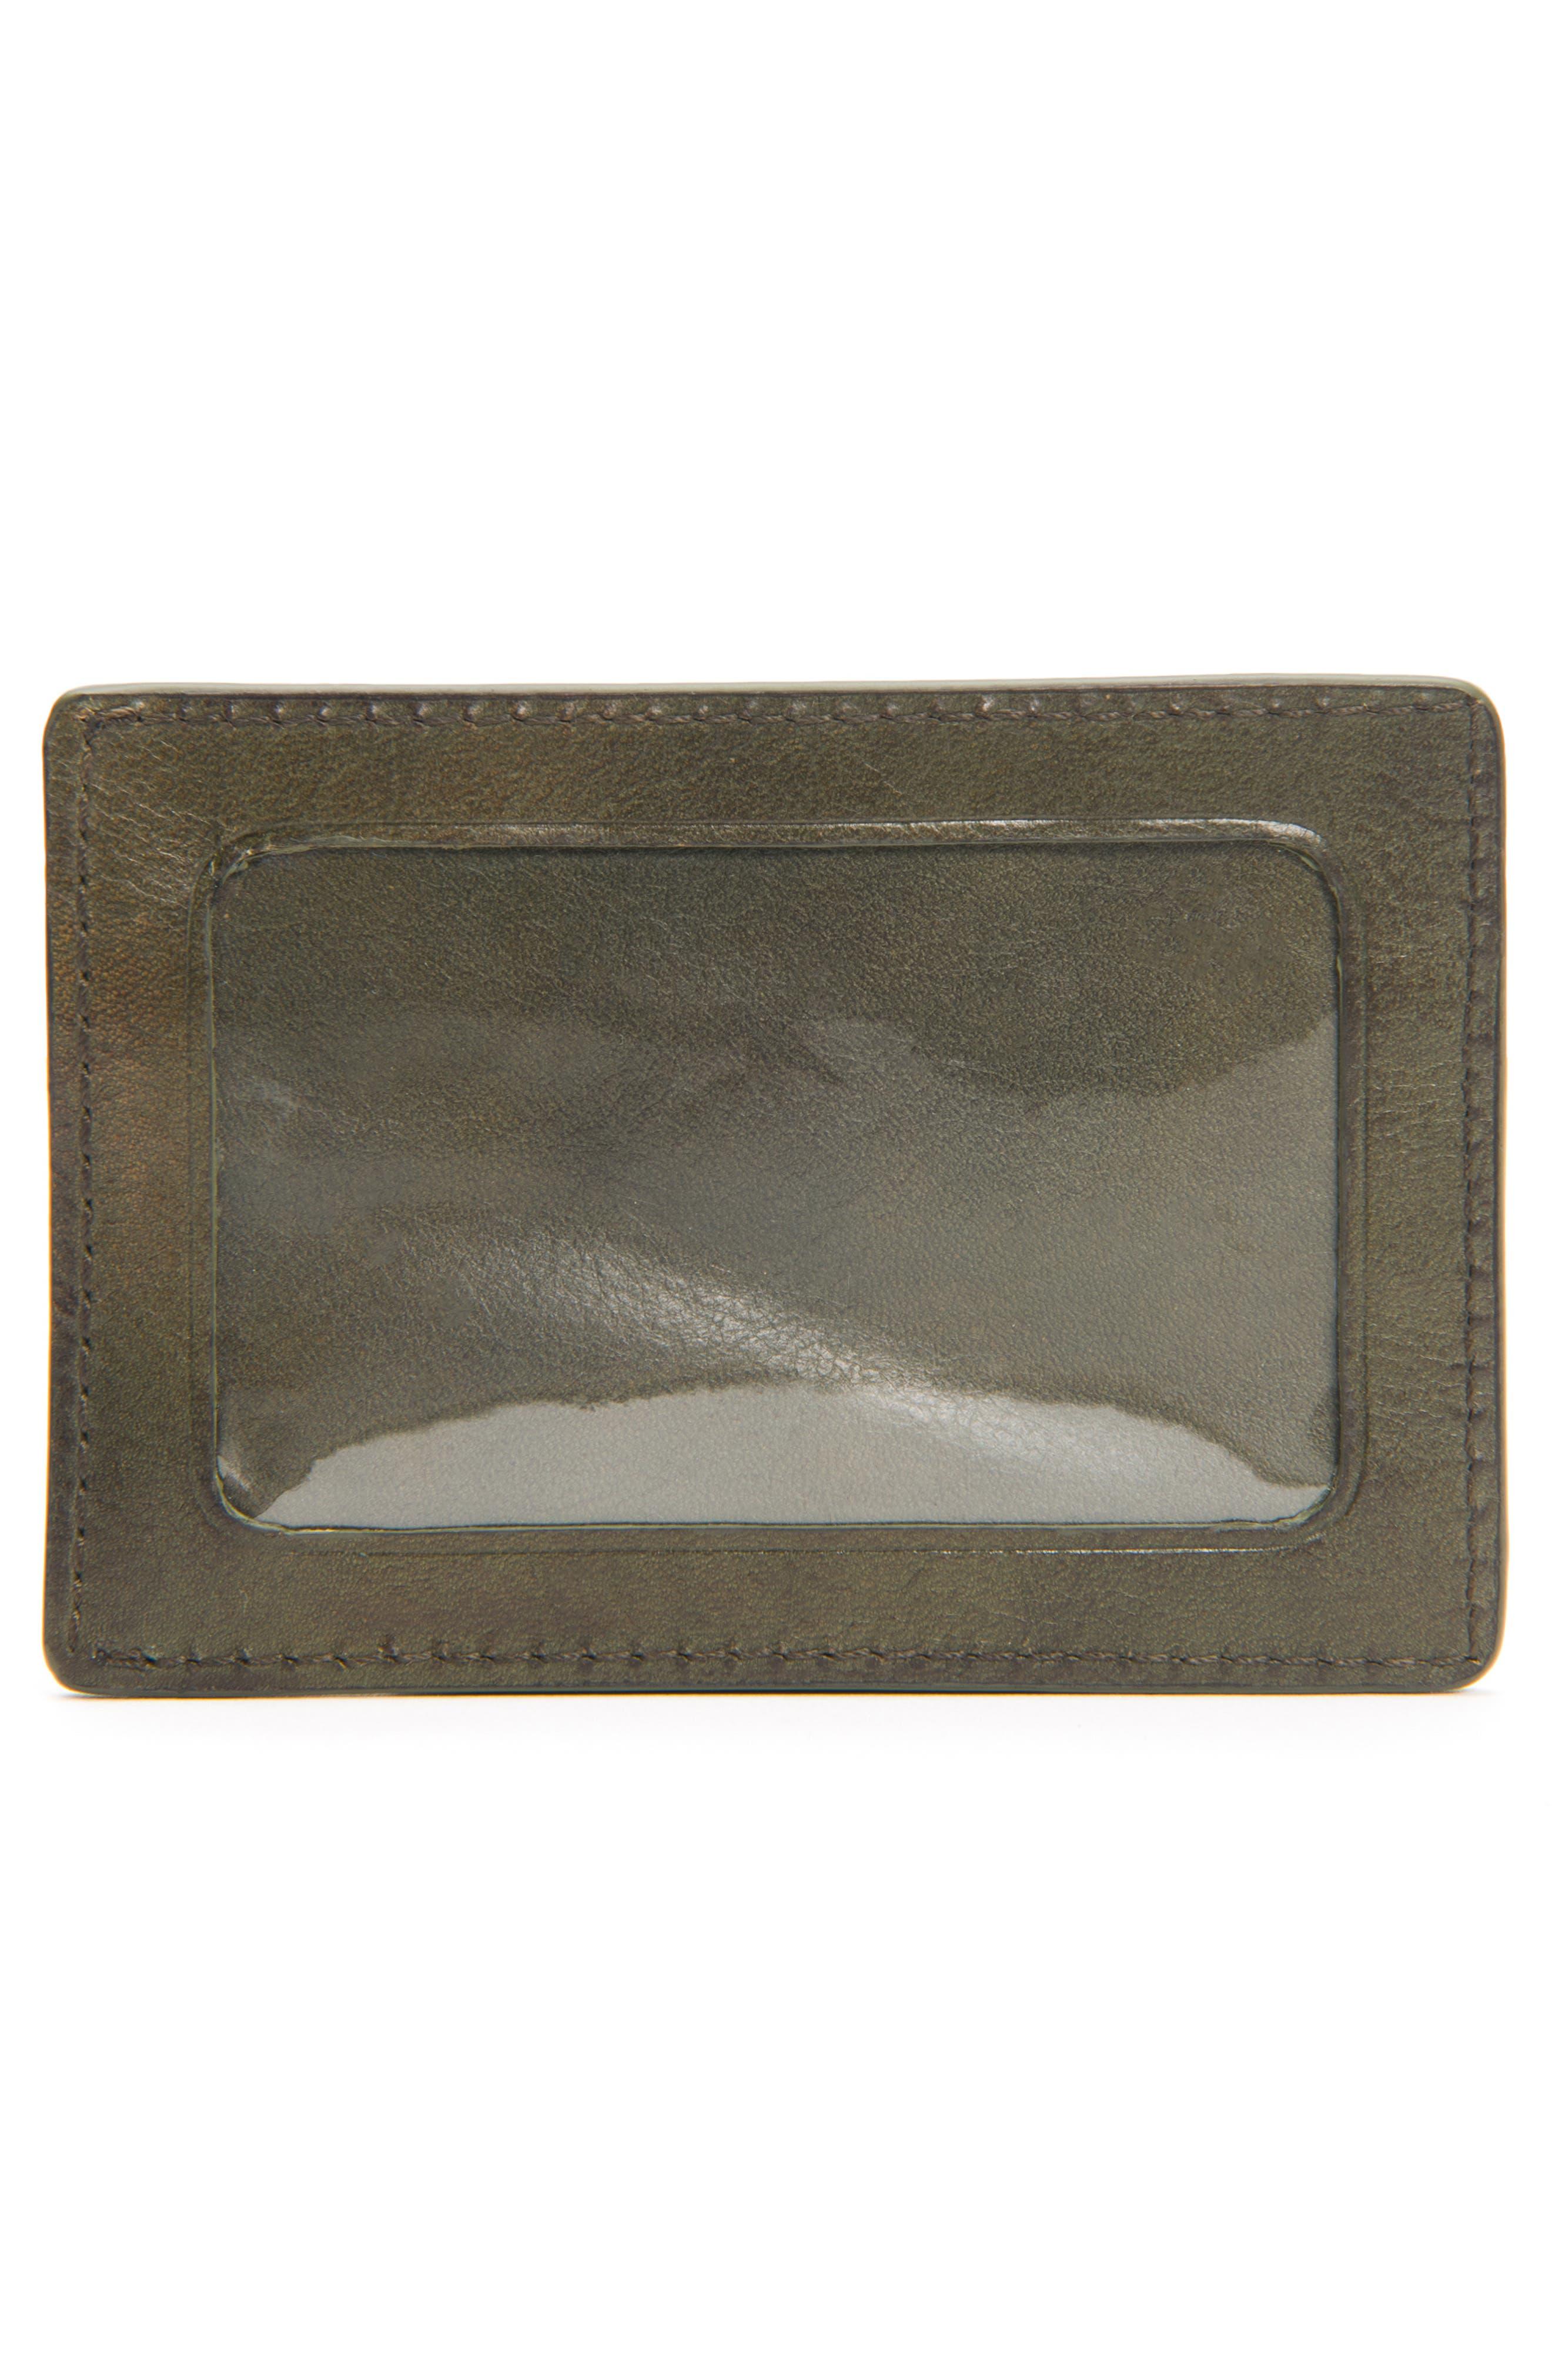 Oliver Leather Card Case,                             Alternate thumbnail 3, color,                             OLIVE